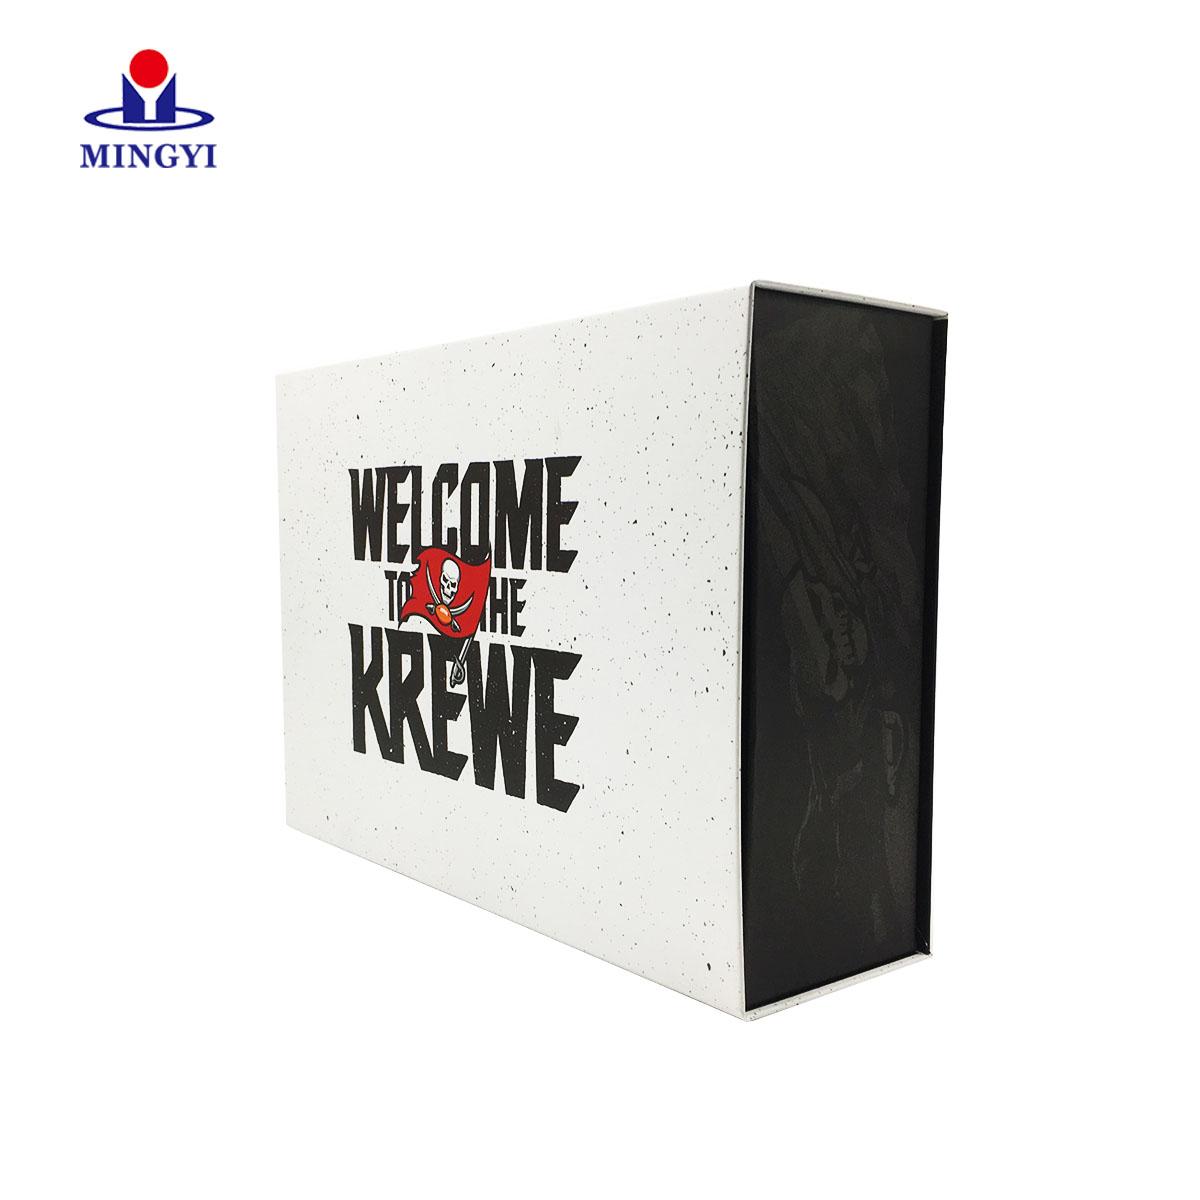 Mingyi Printing Wholesale folding gift box company for phone-gift box, hang tags, packaging stickers-Mingyi Printing